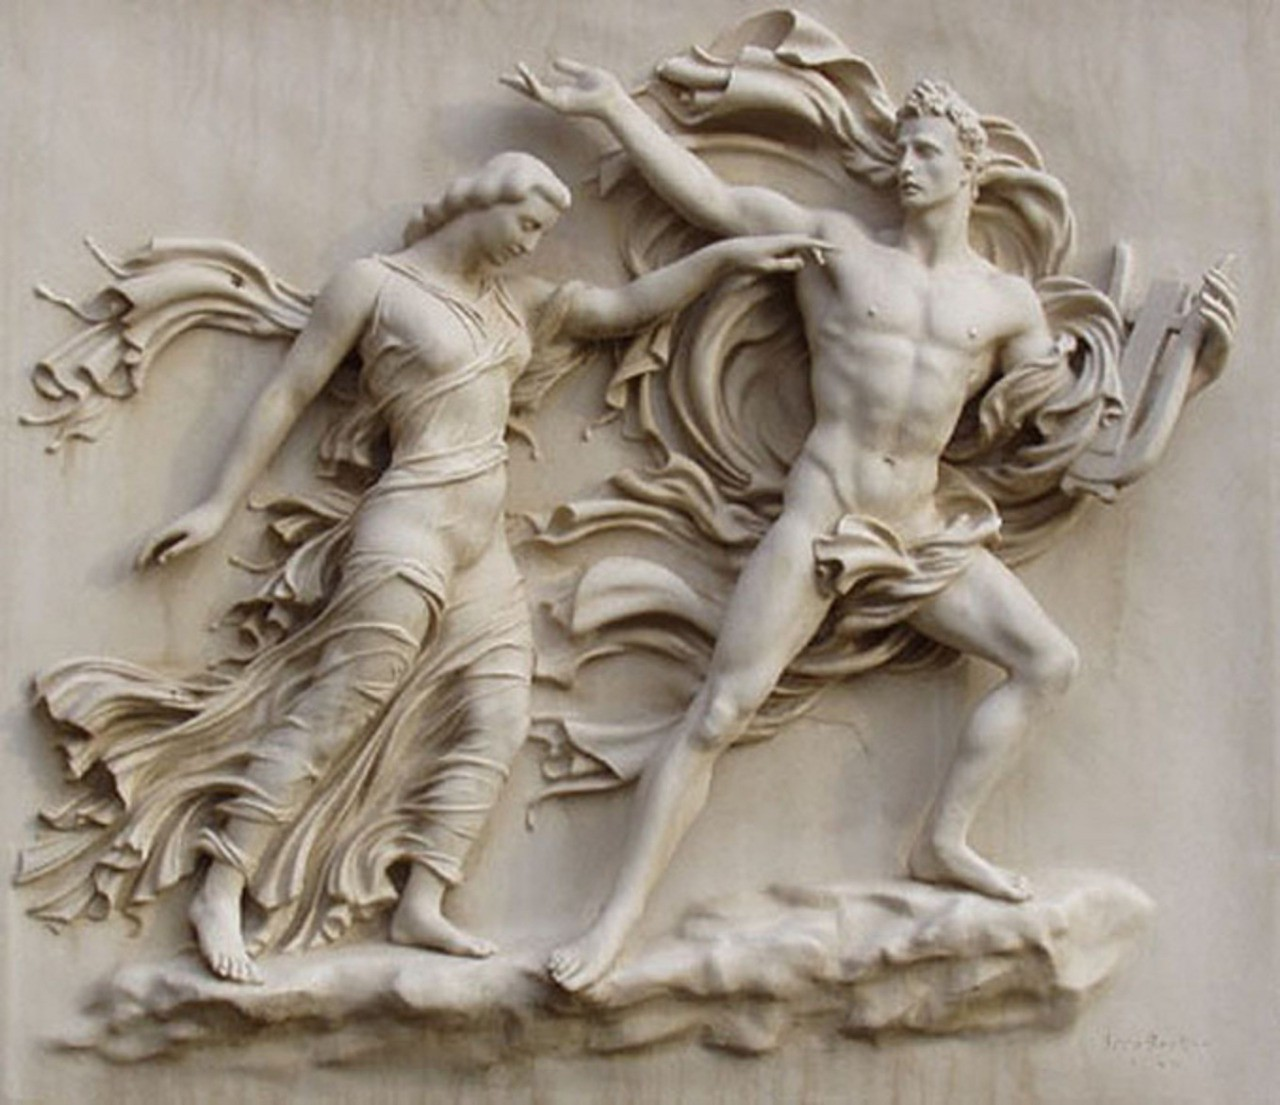 Bas relief art